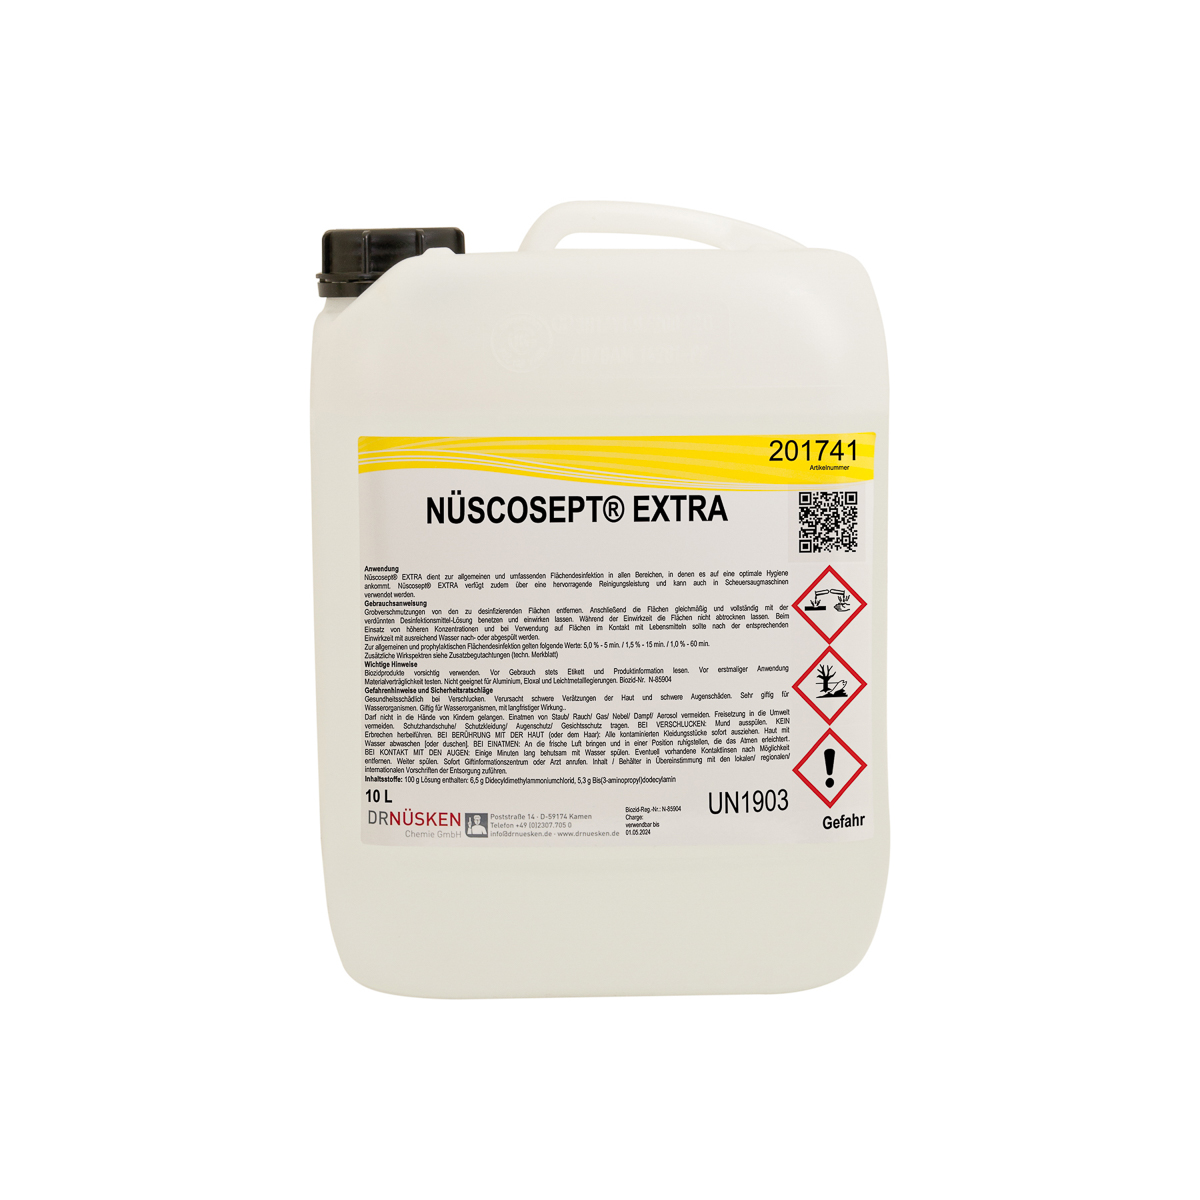 Nüscosept® EXTRA 10 Liter